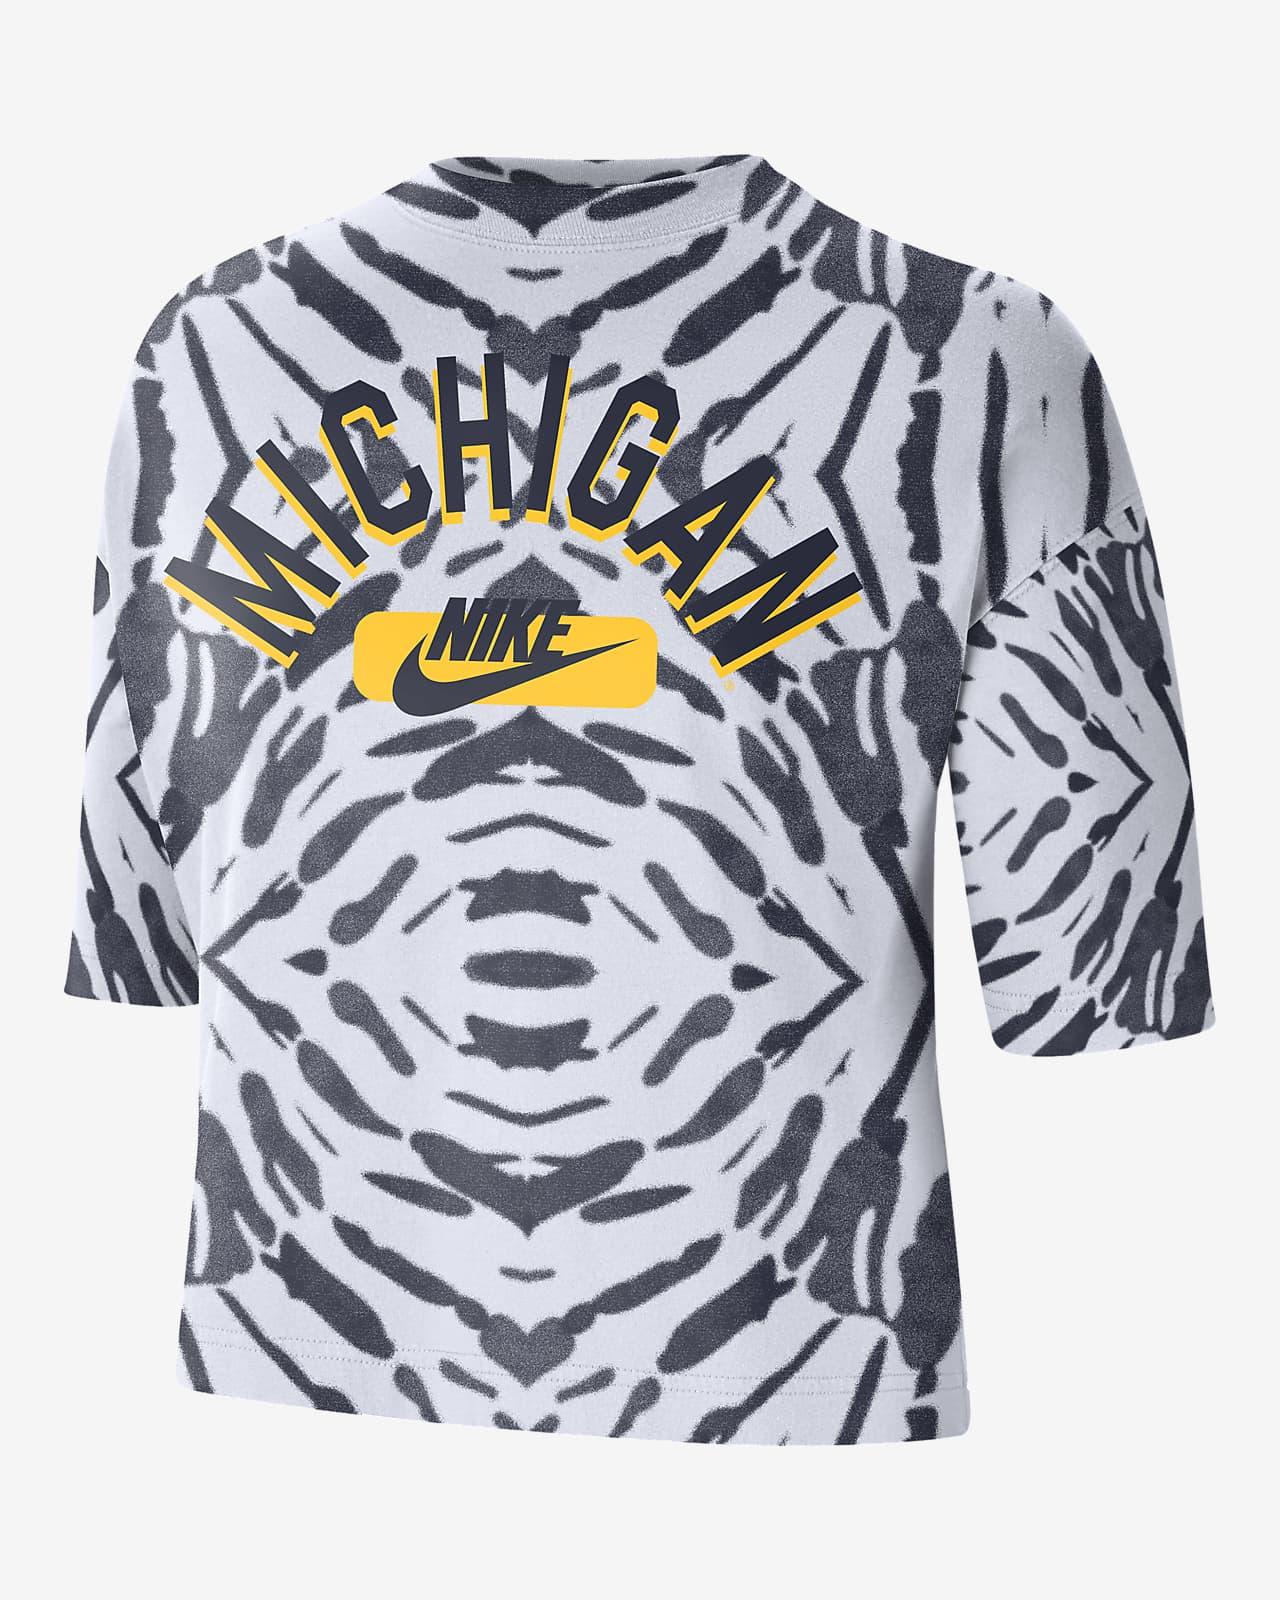 Nike College (Michigan) Women's Boxy Printed T-Shirt